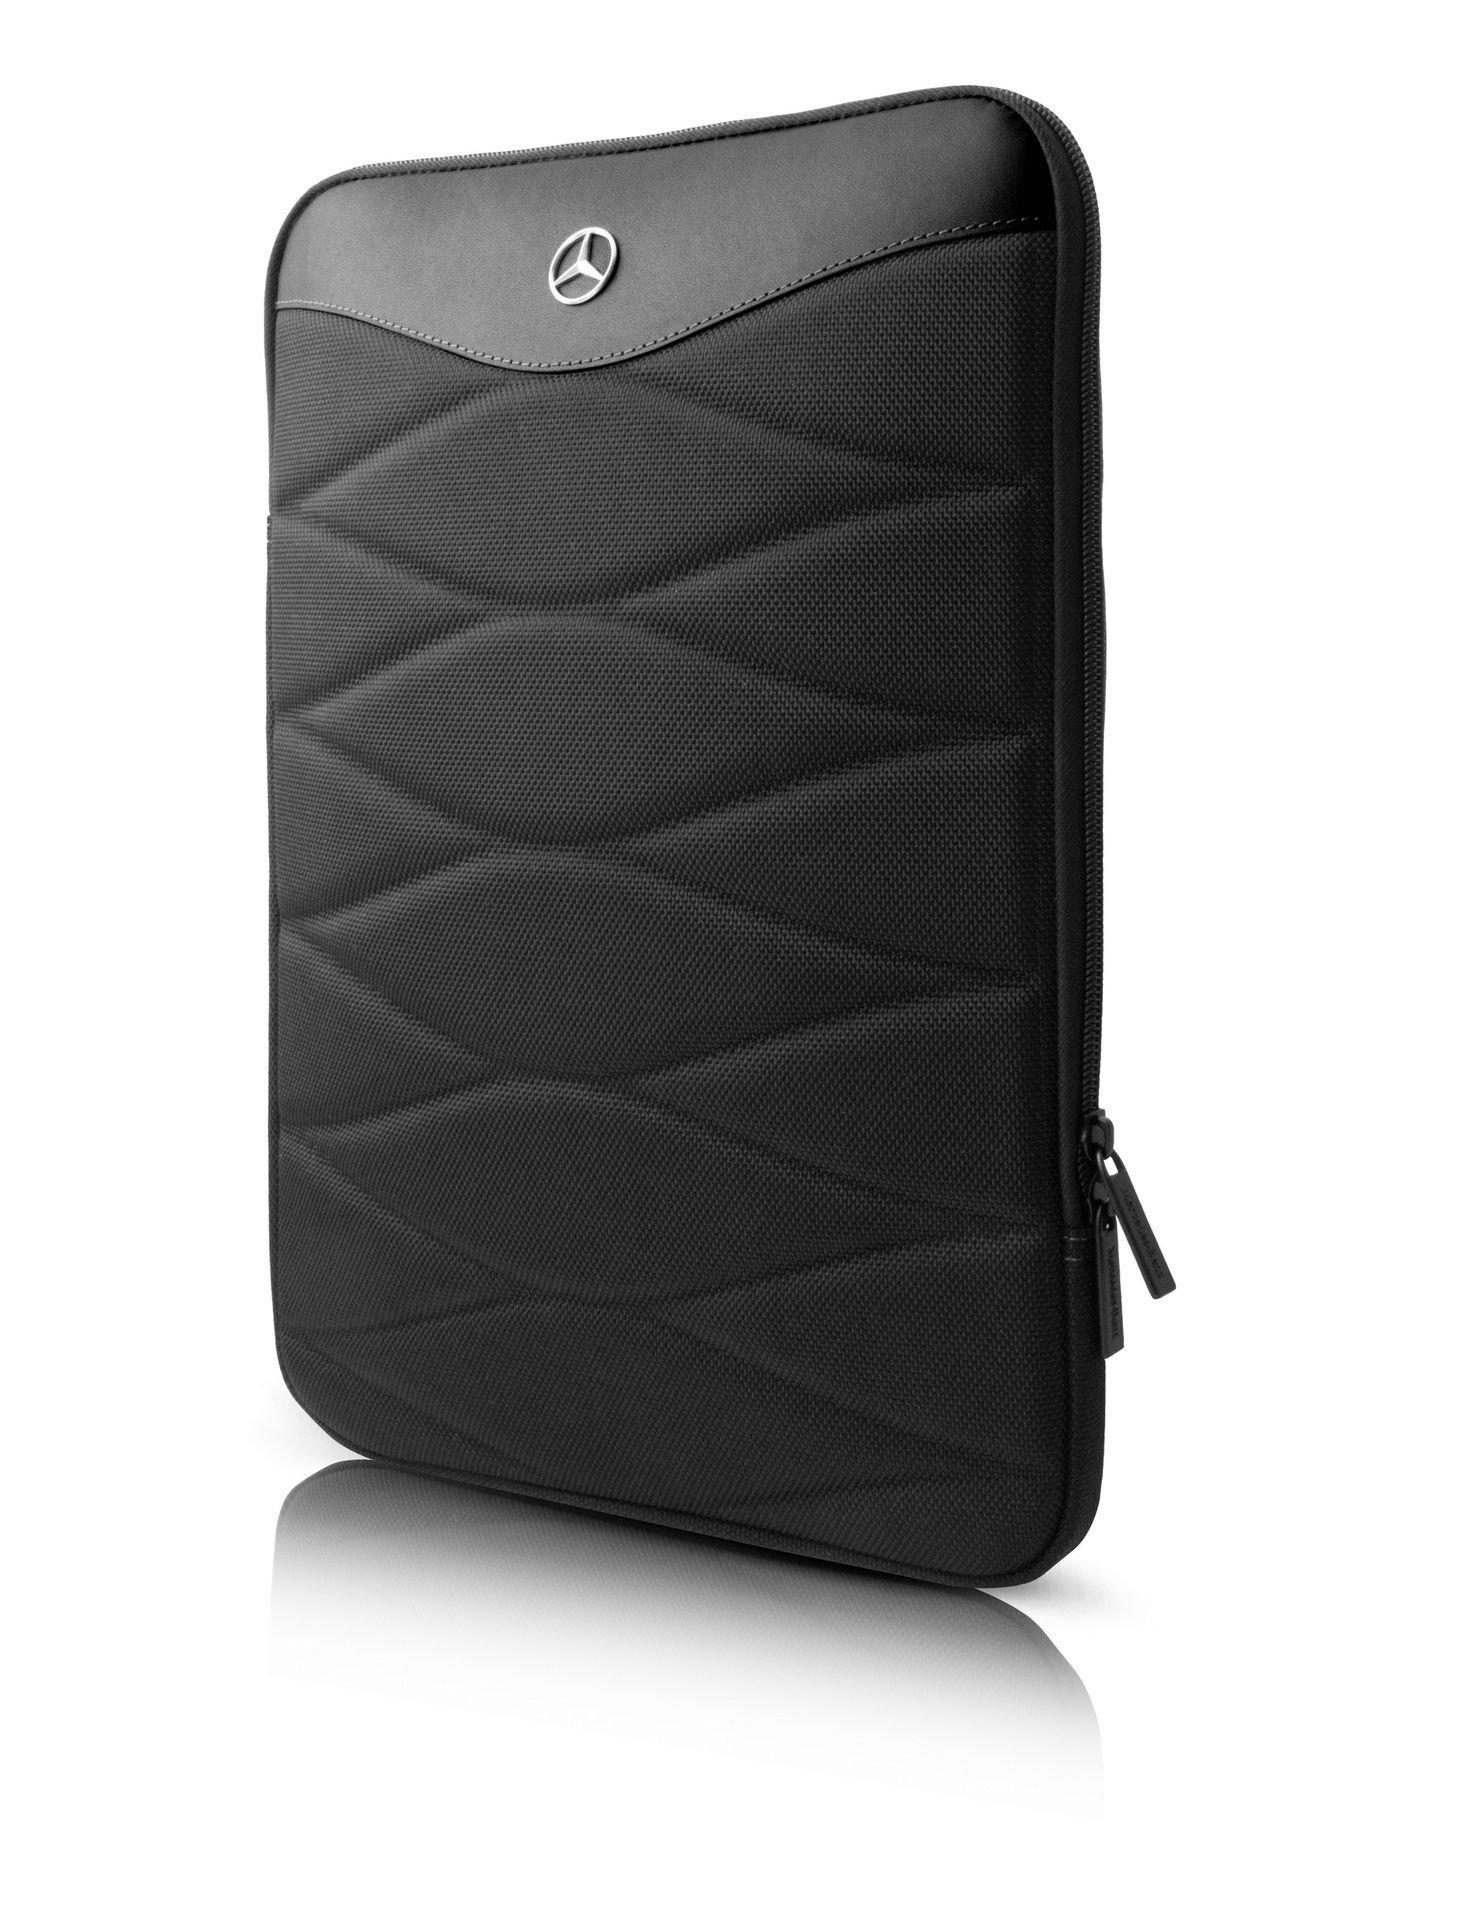 mercedes-benz-iphone-covers-18.jpg